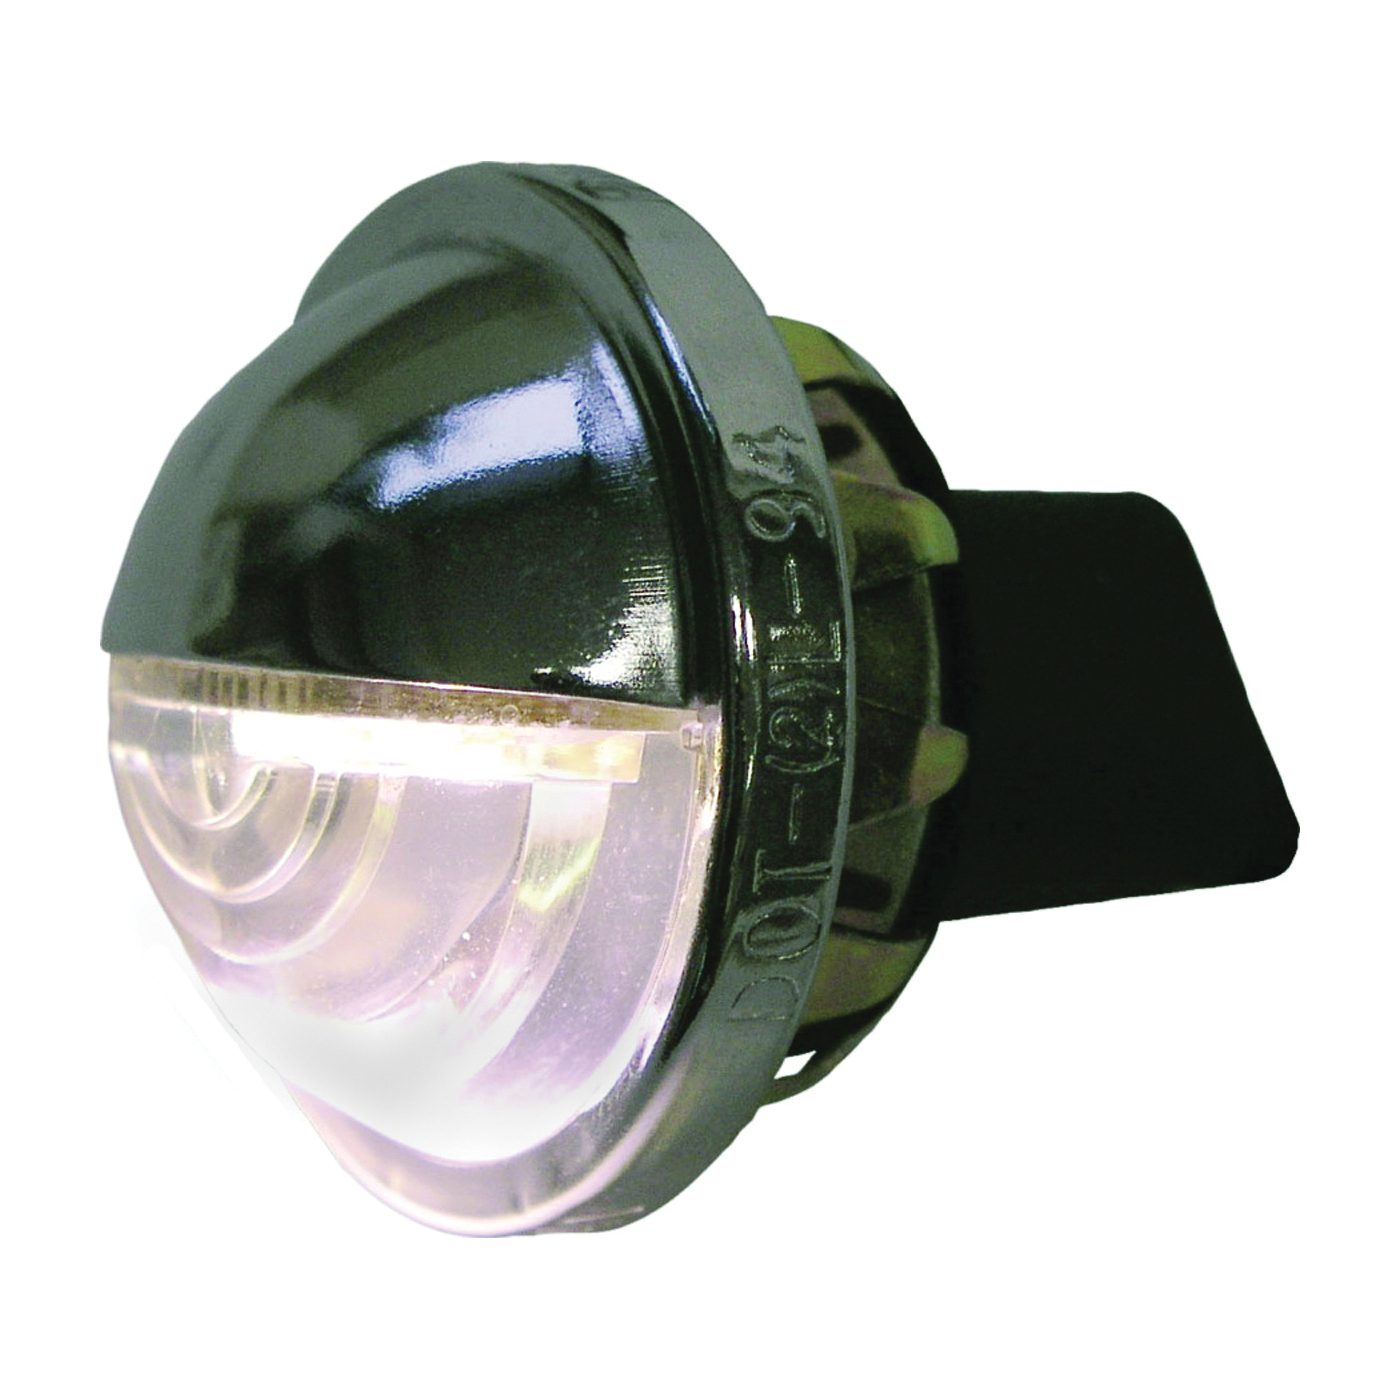 Picture of PM V298C License Plate Light, 4 -Lamp, LED Lamp